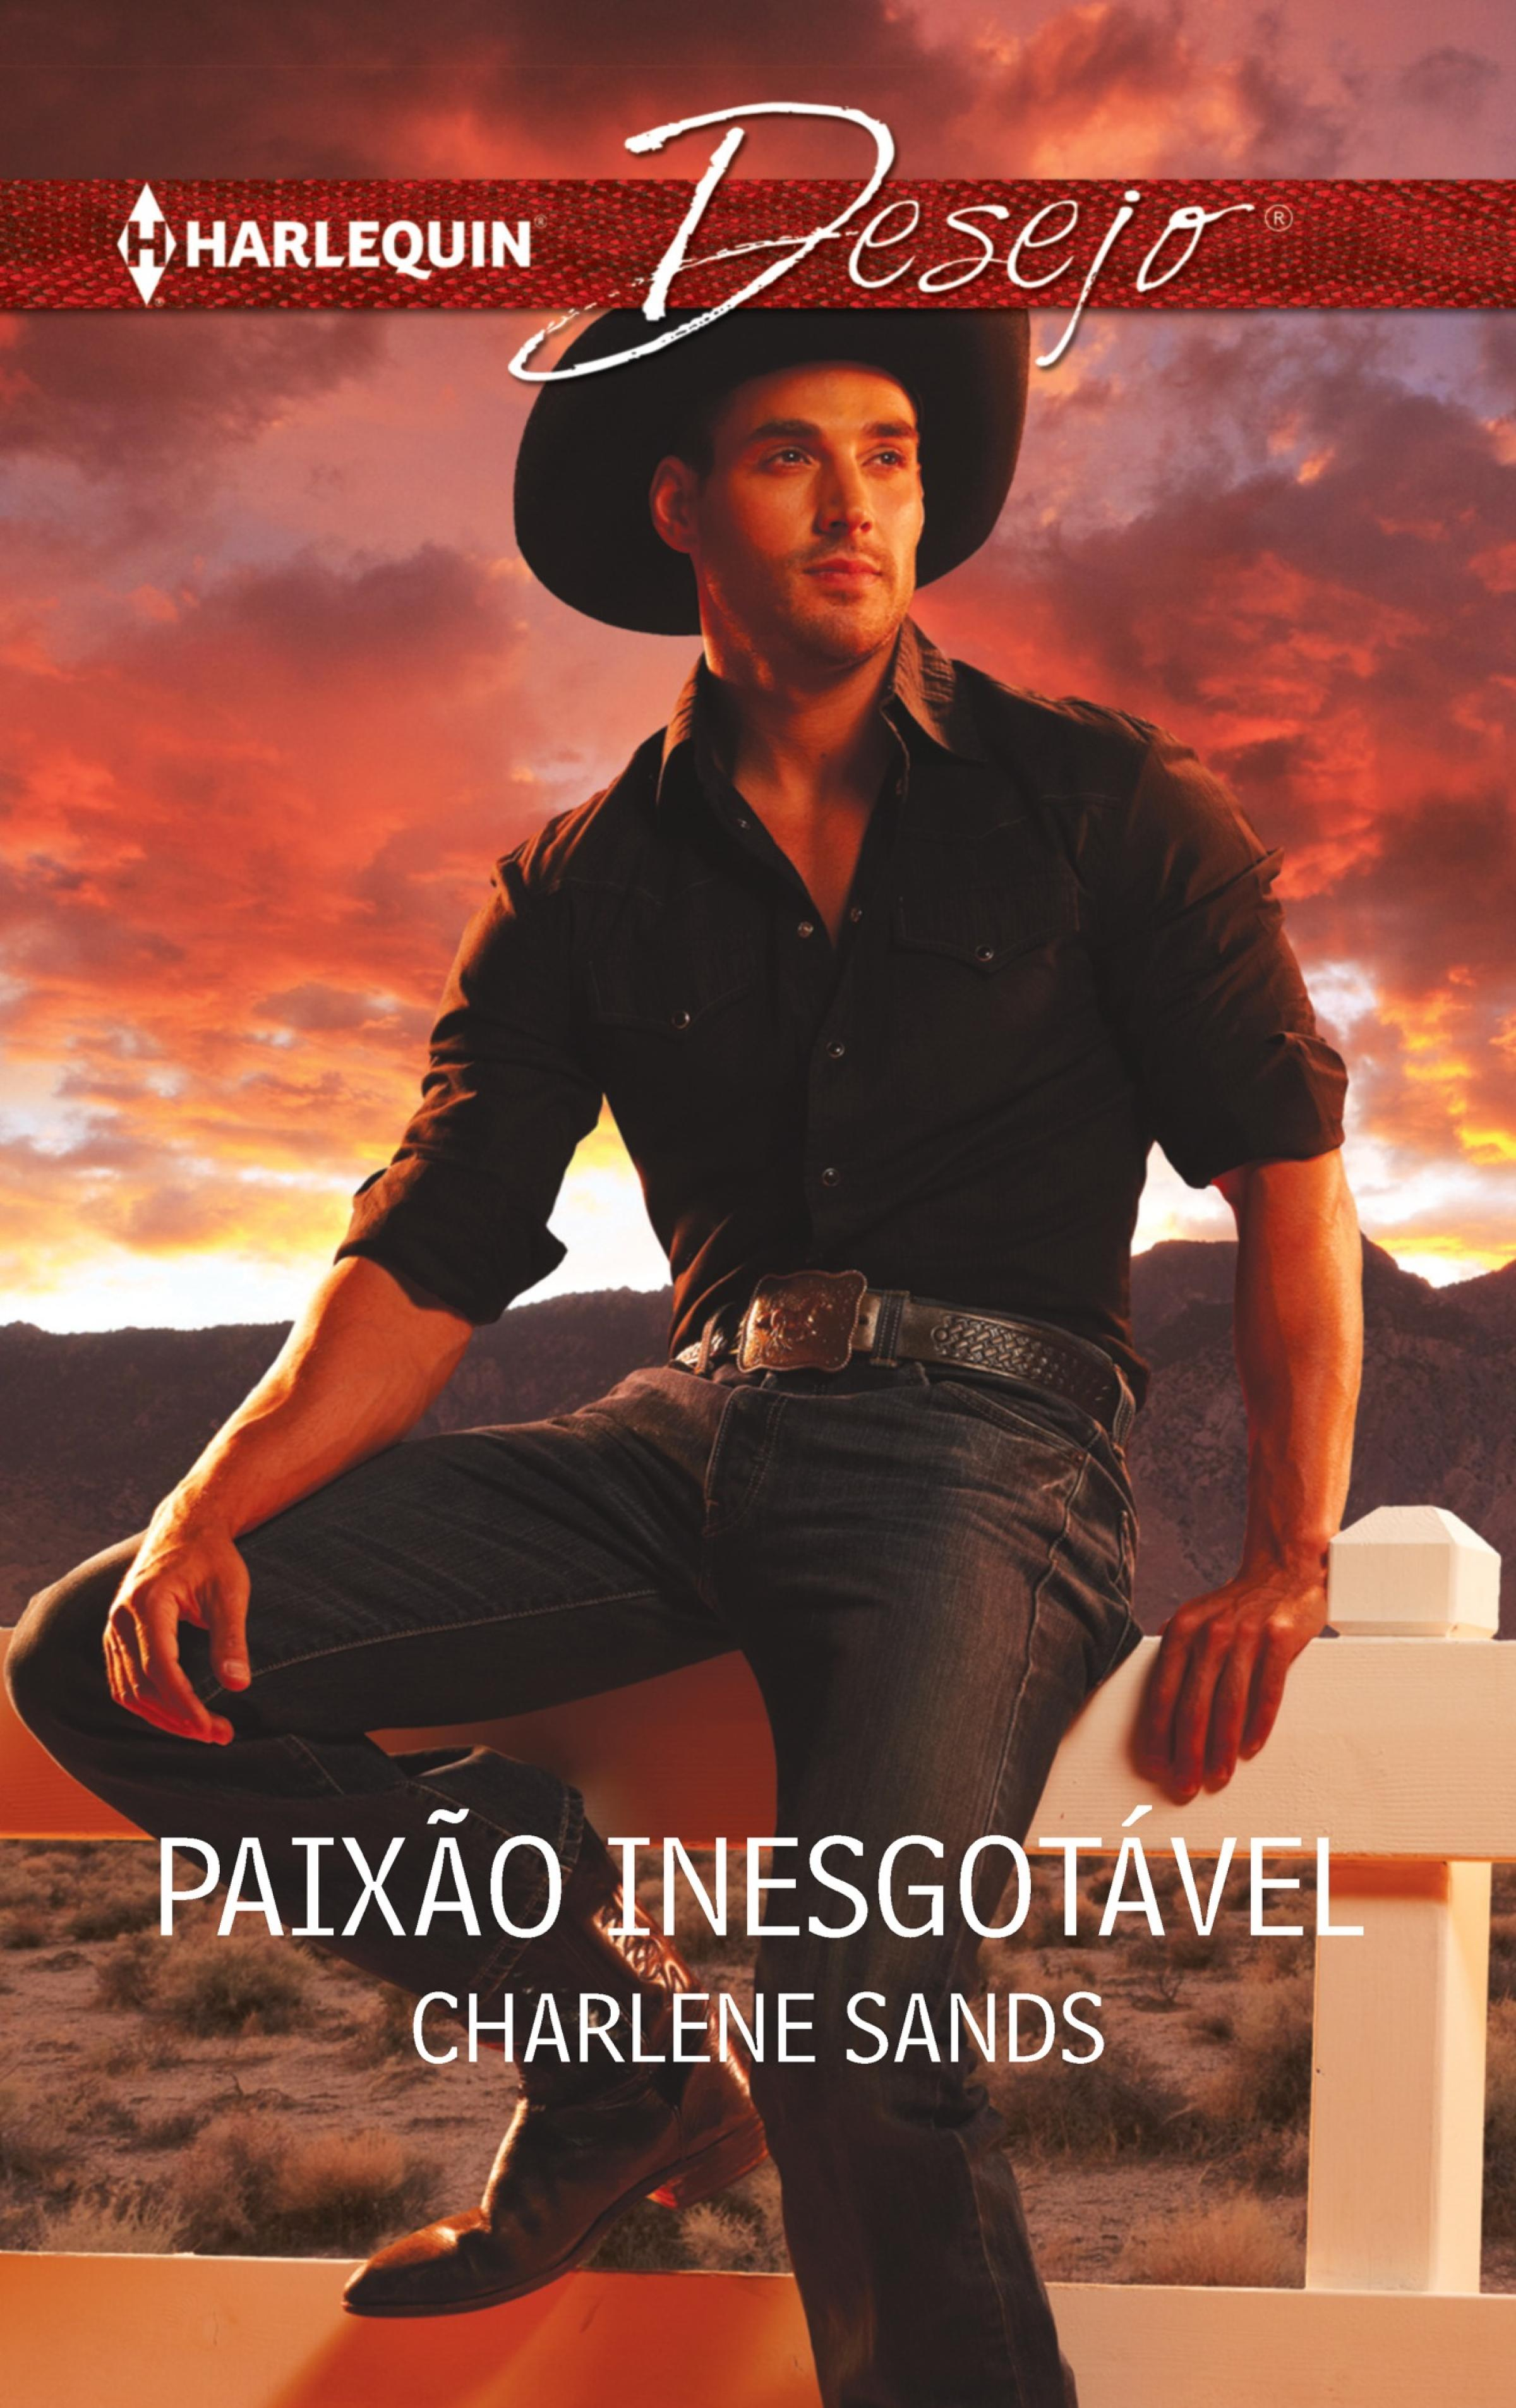 Charlene Sands Paixão inesgotável charlene sands expecting the cowboy s baby